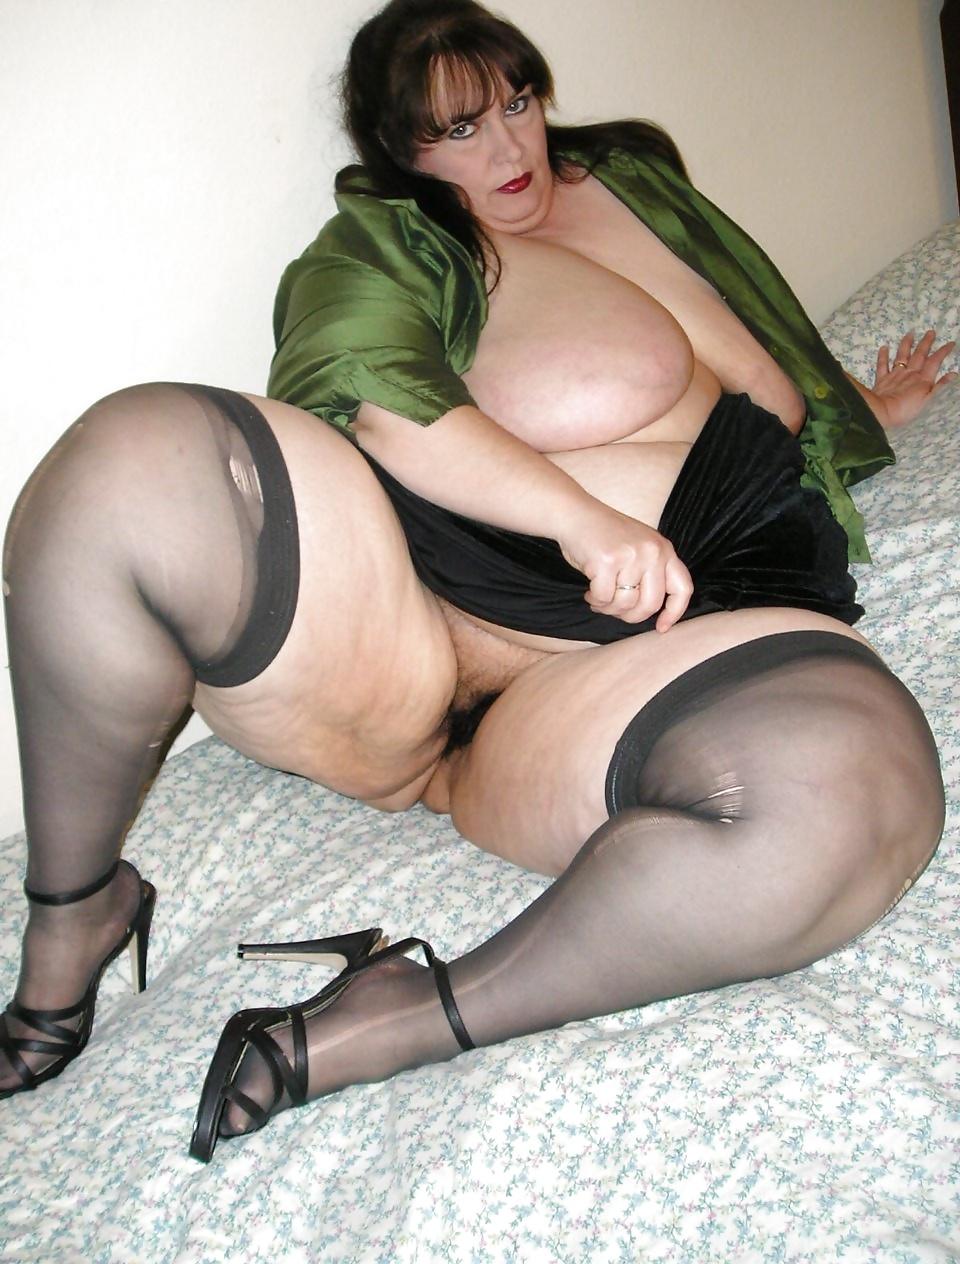 Порно фото чулках толстушек